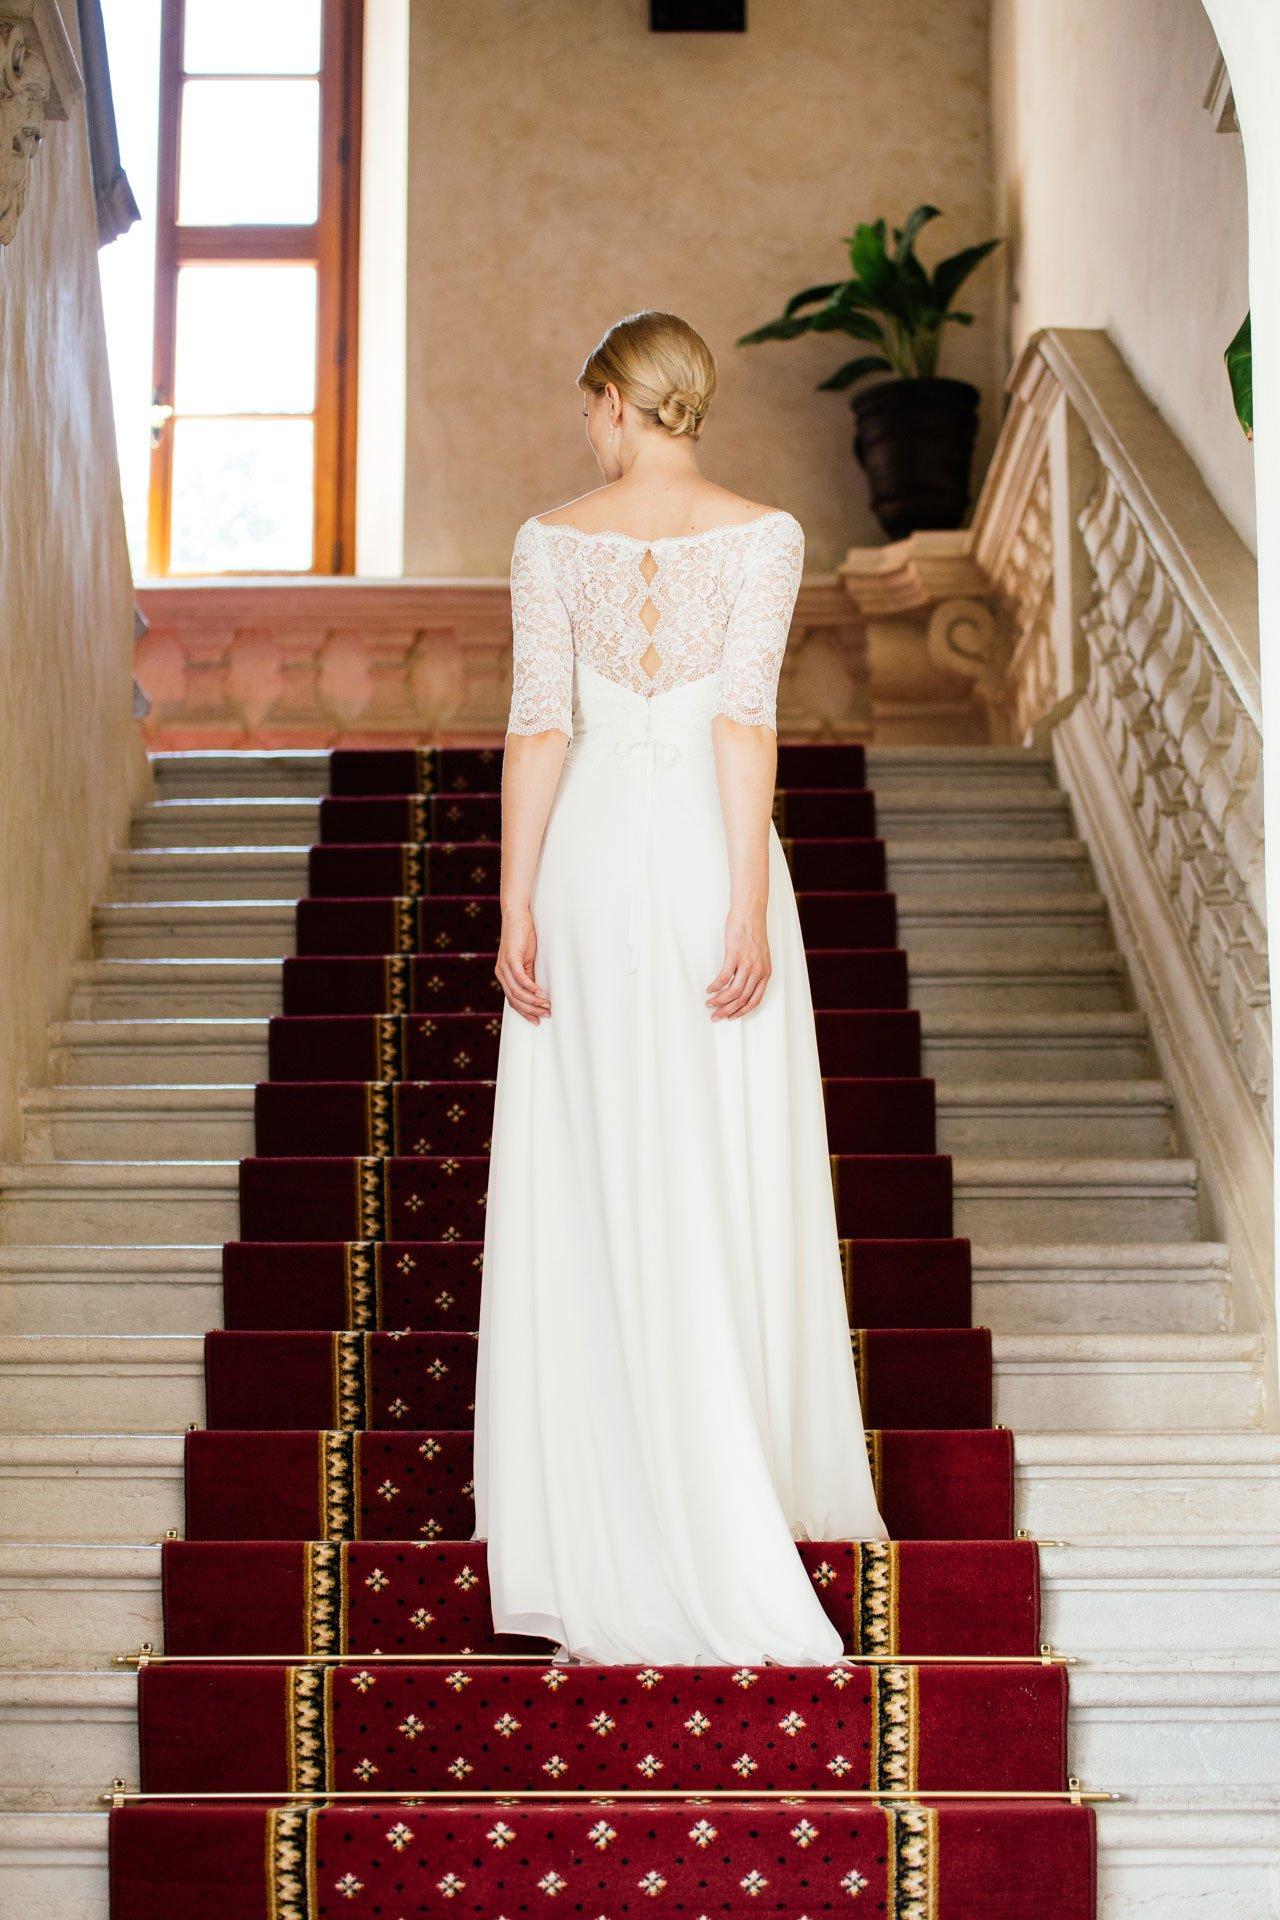 Brautkleid Spitze Ärmel – Vintage Bolero